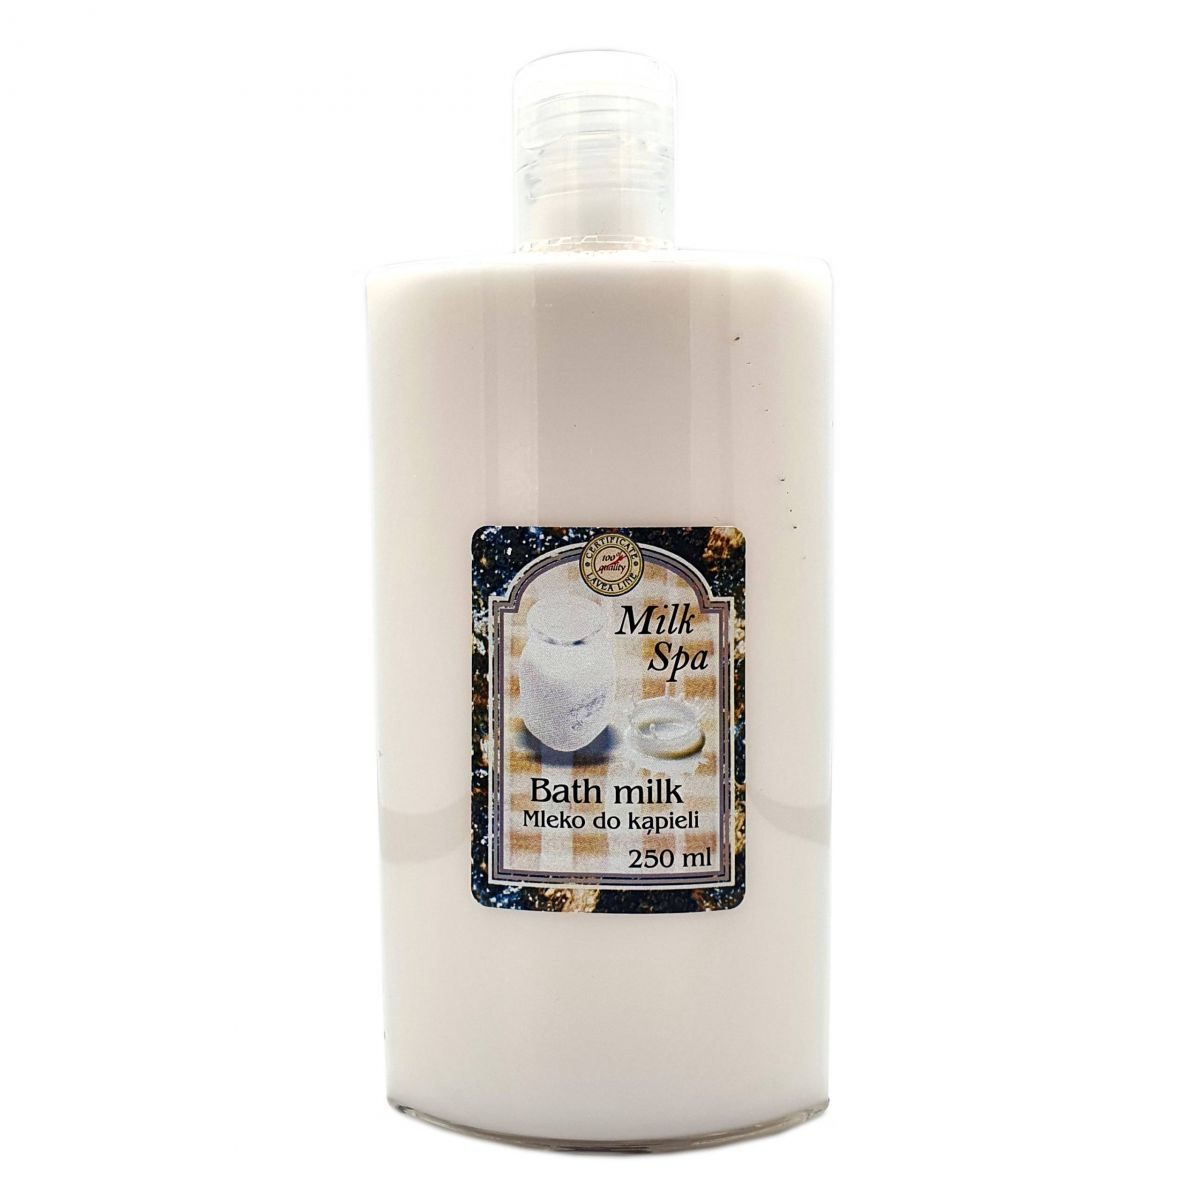 Mleko do kąpieli - Milk Spa - 250ml - Lavea